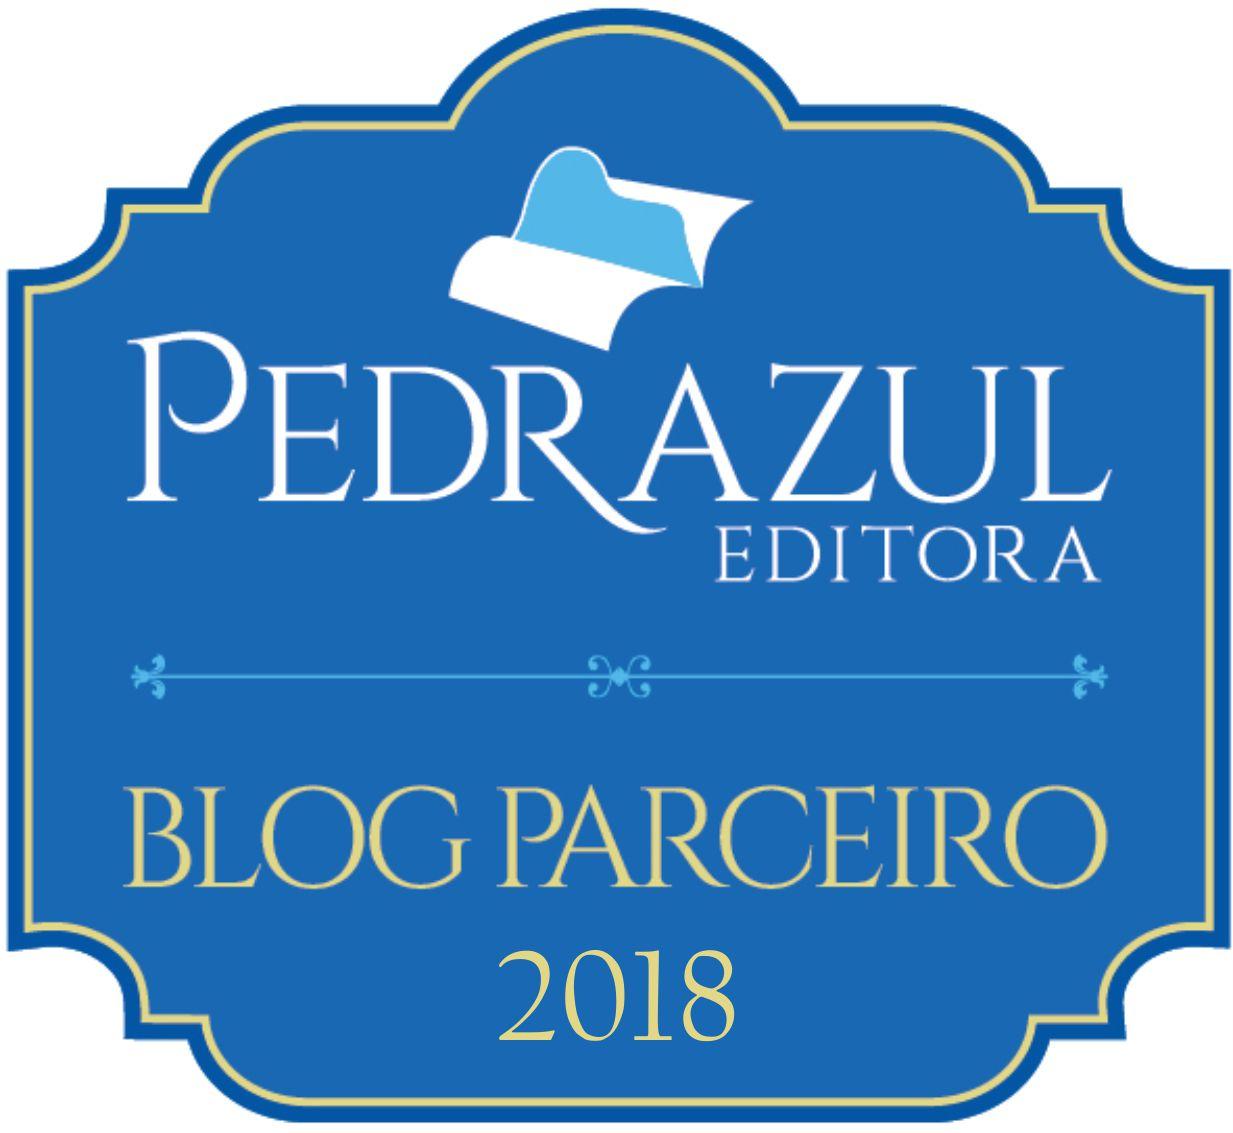 Parceria Pedra Azul Editora 2018